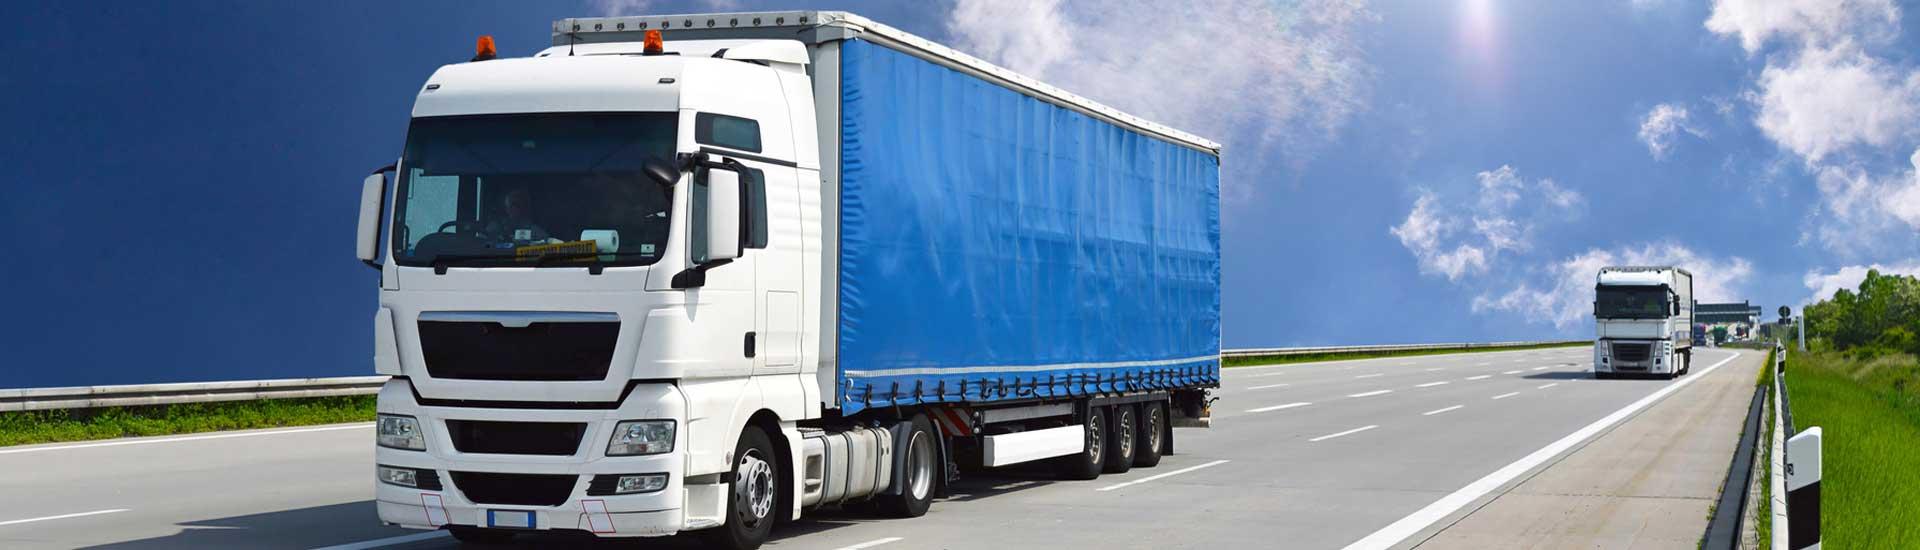 Fachkundeprüfung Güterkraftverkehr